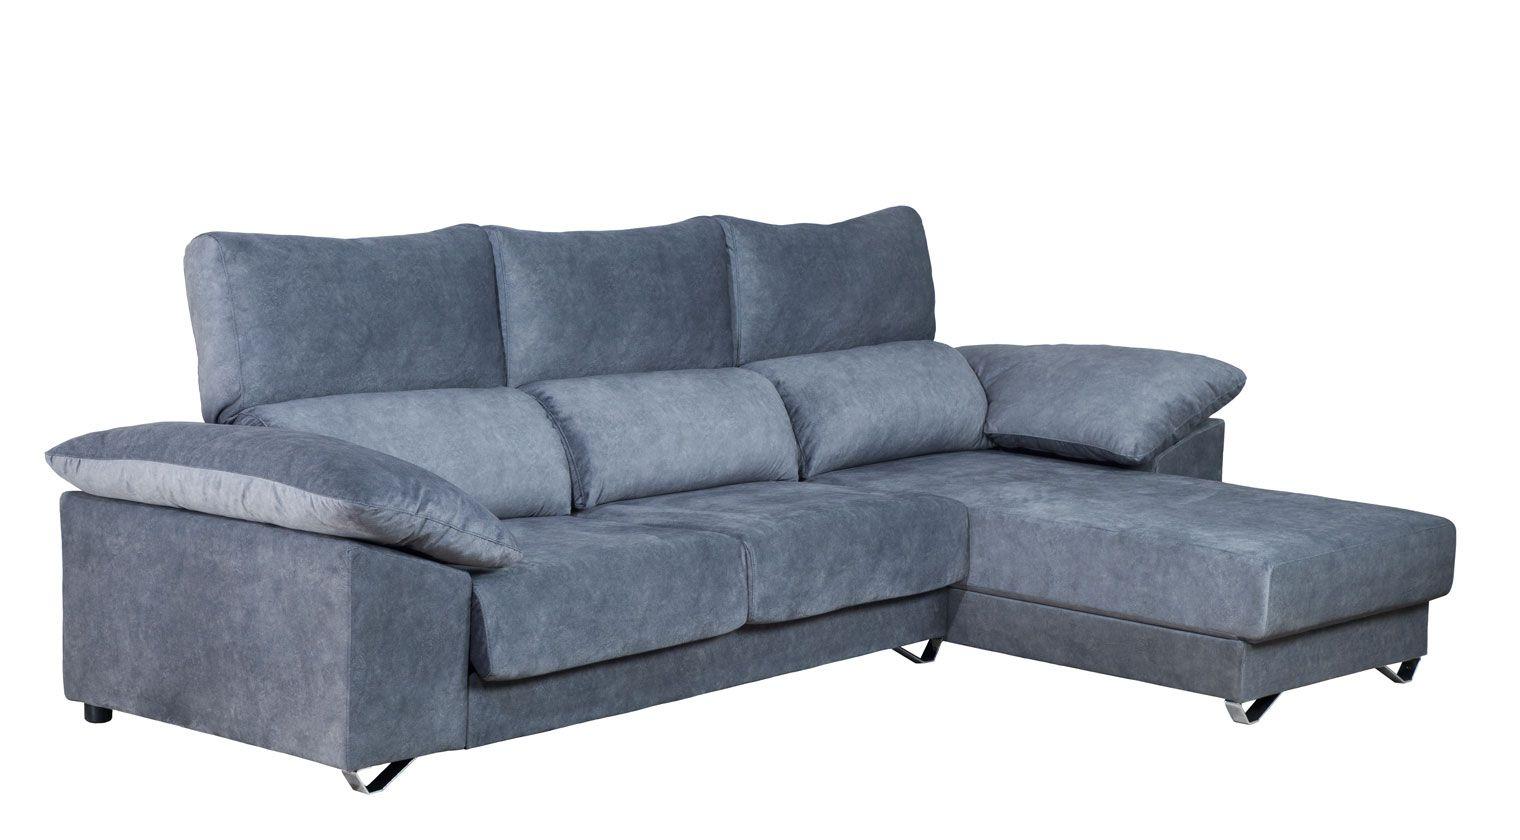 Comprar chaise longue tela pindo mod 3 plazas chaise for Comprar chaise longue barato online